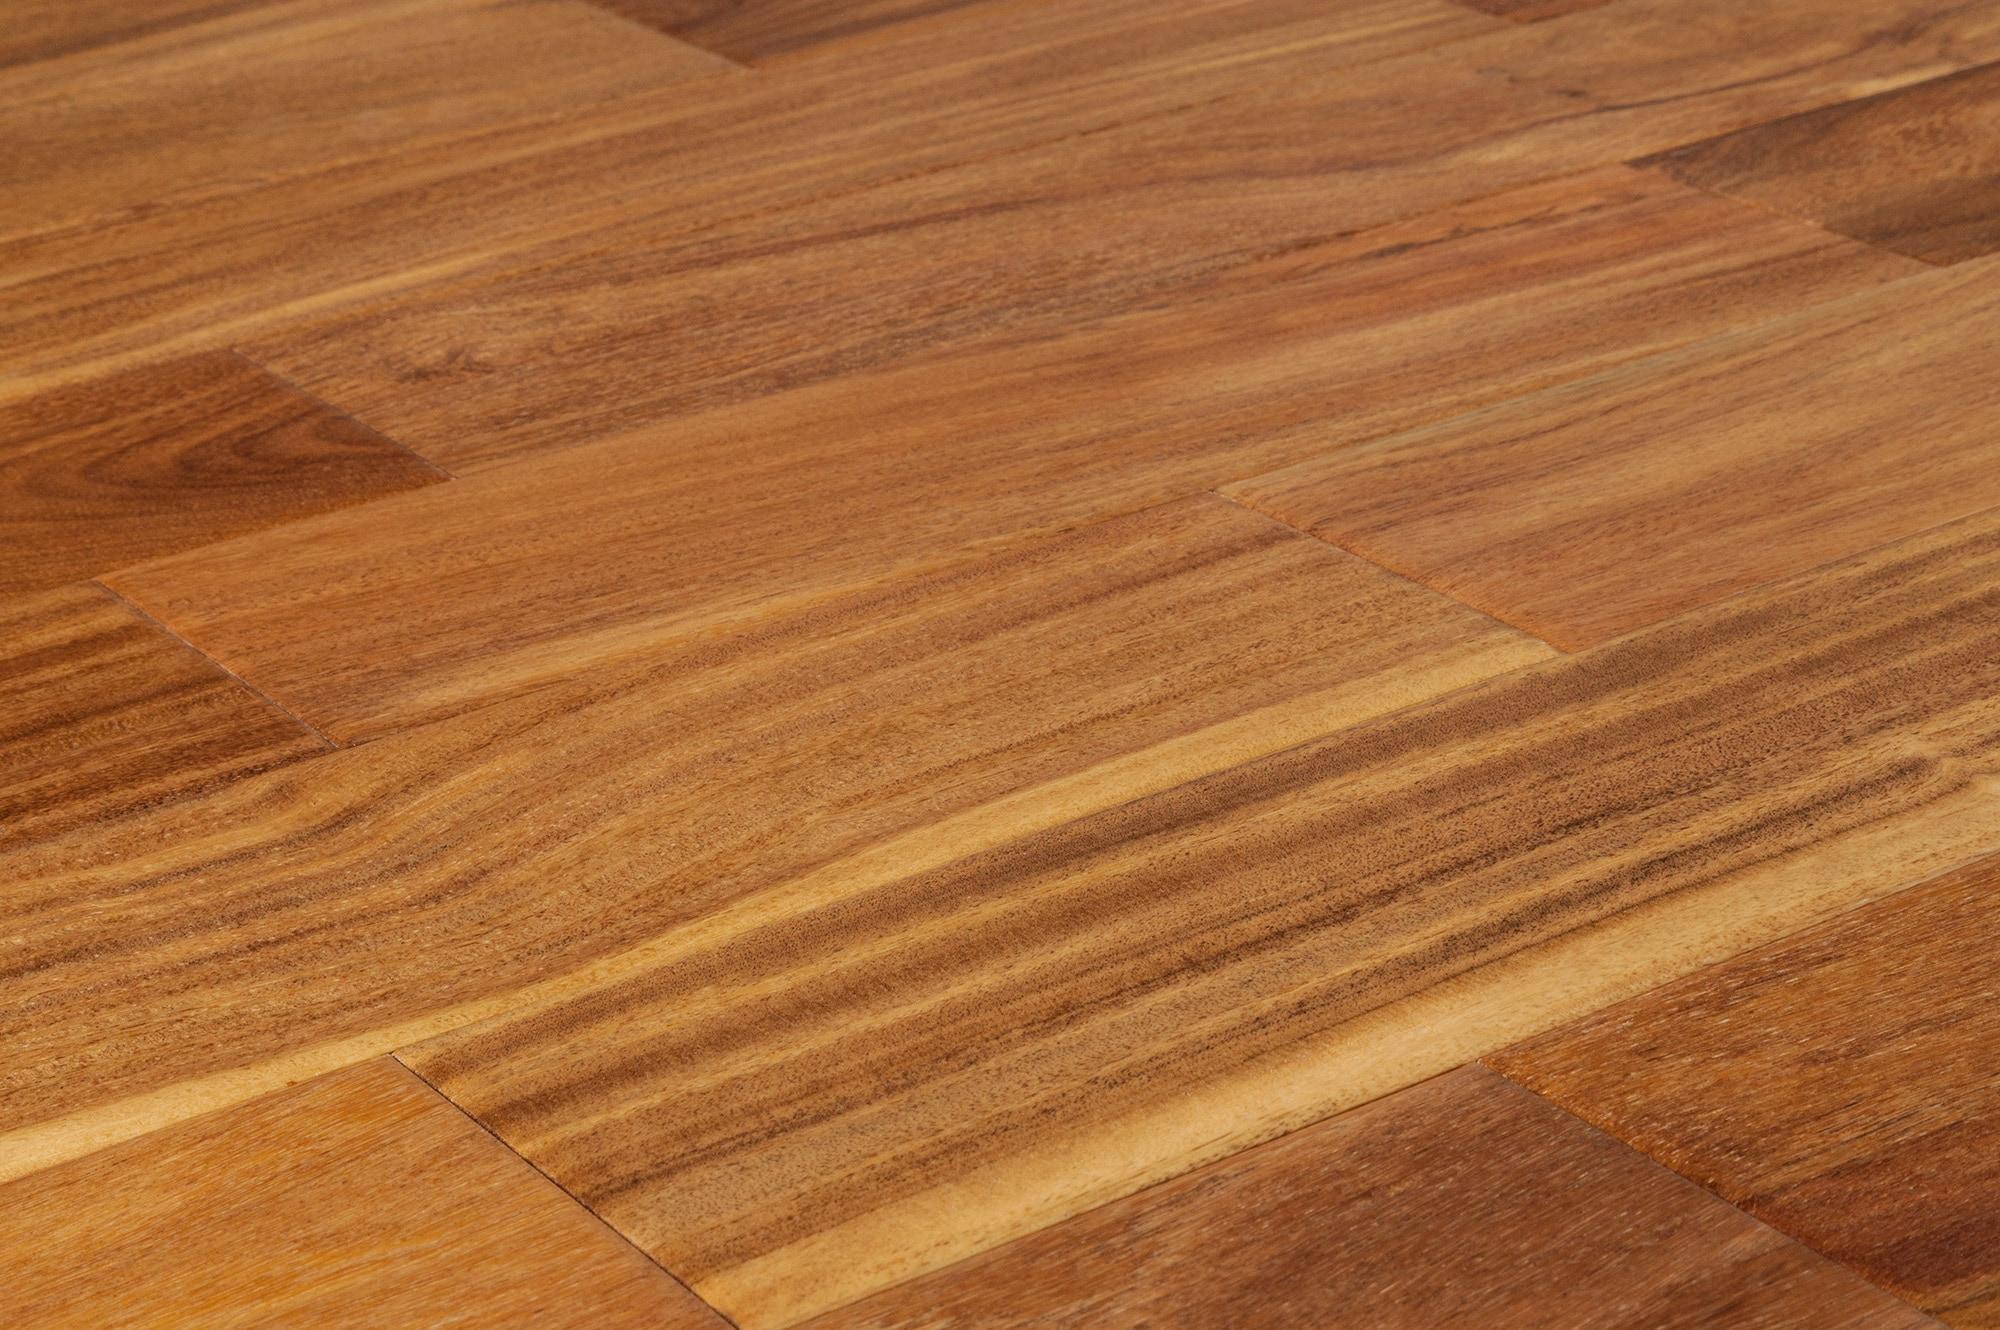 Cumaru Hardwood Flooring cumaru flooring Free Samples Mazama Hardwood Handscraped South American Collection Natural Cumaru Builders 5